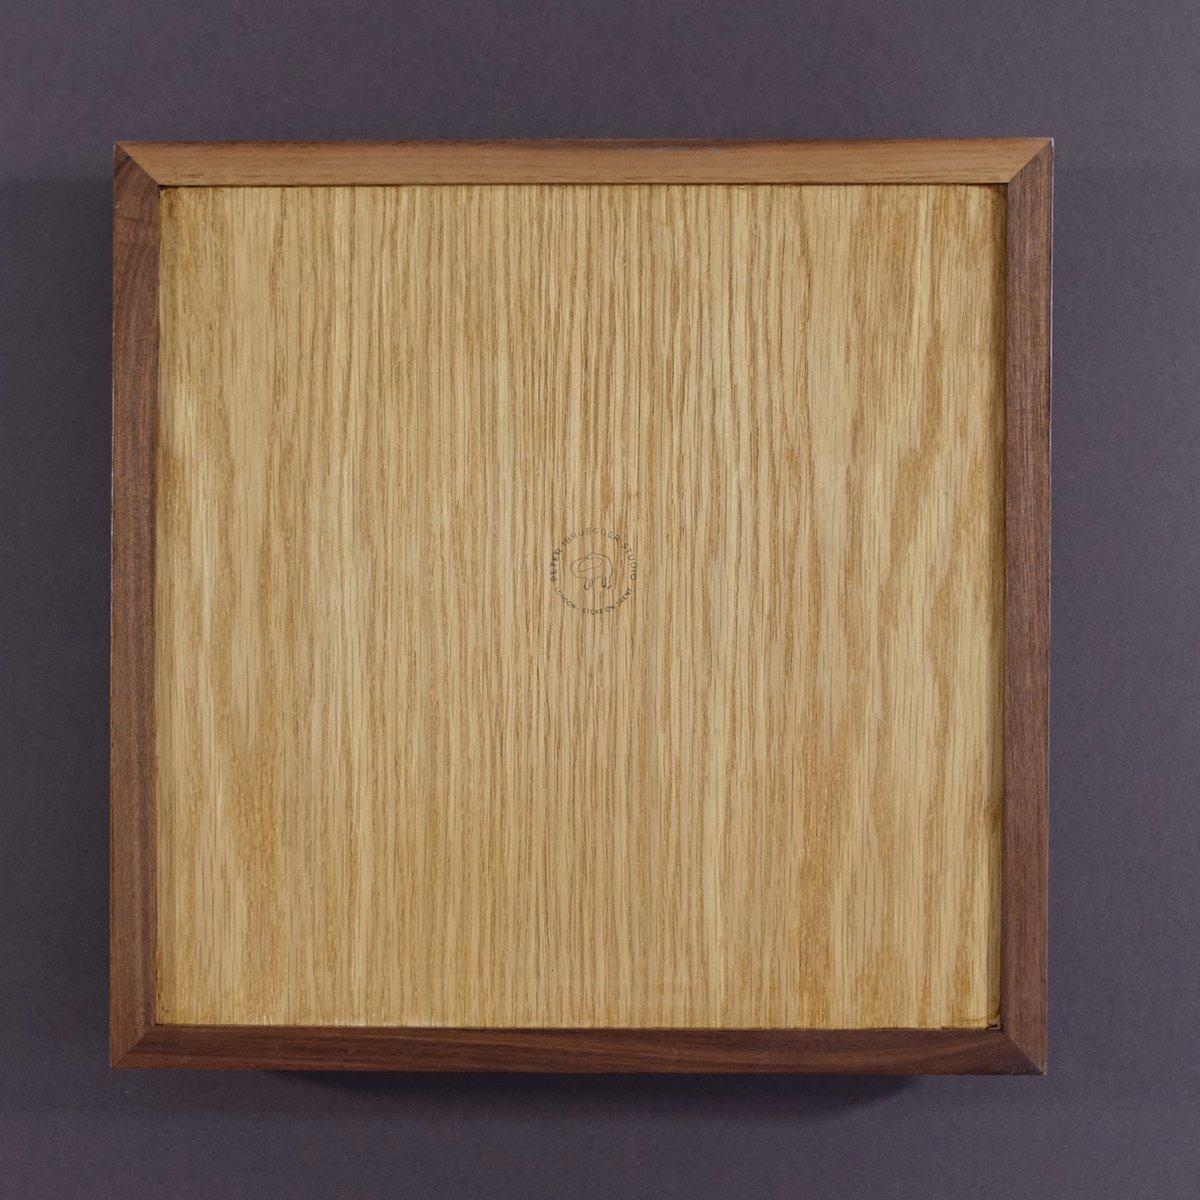 Image of Ouroboros tiled Walnut Tray 04